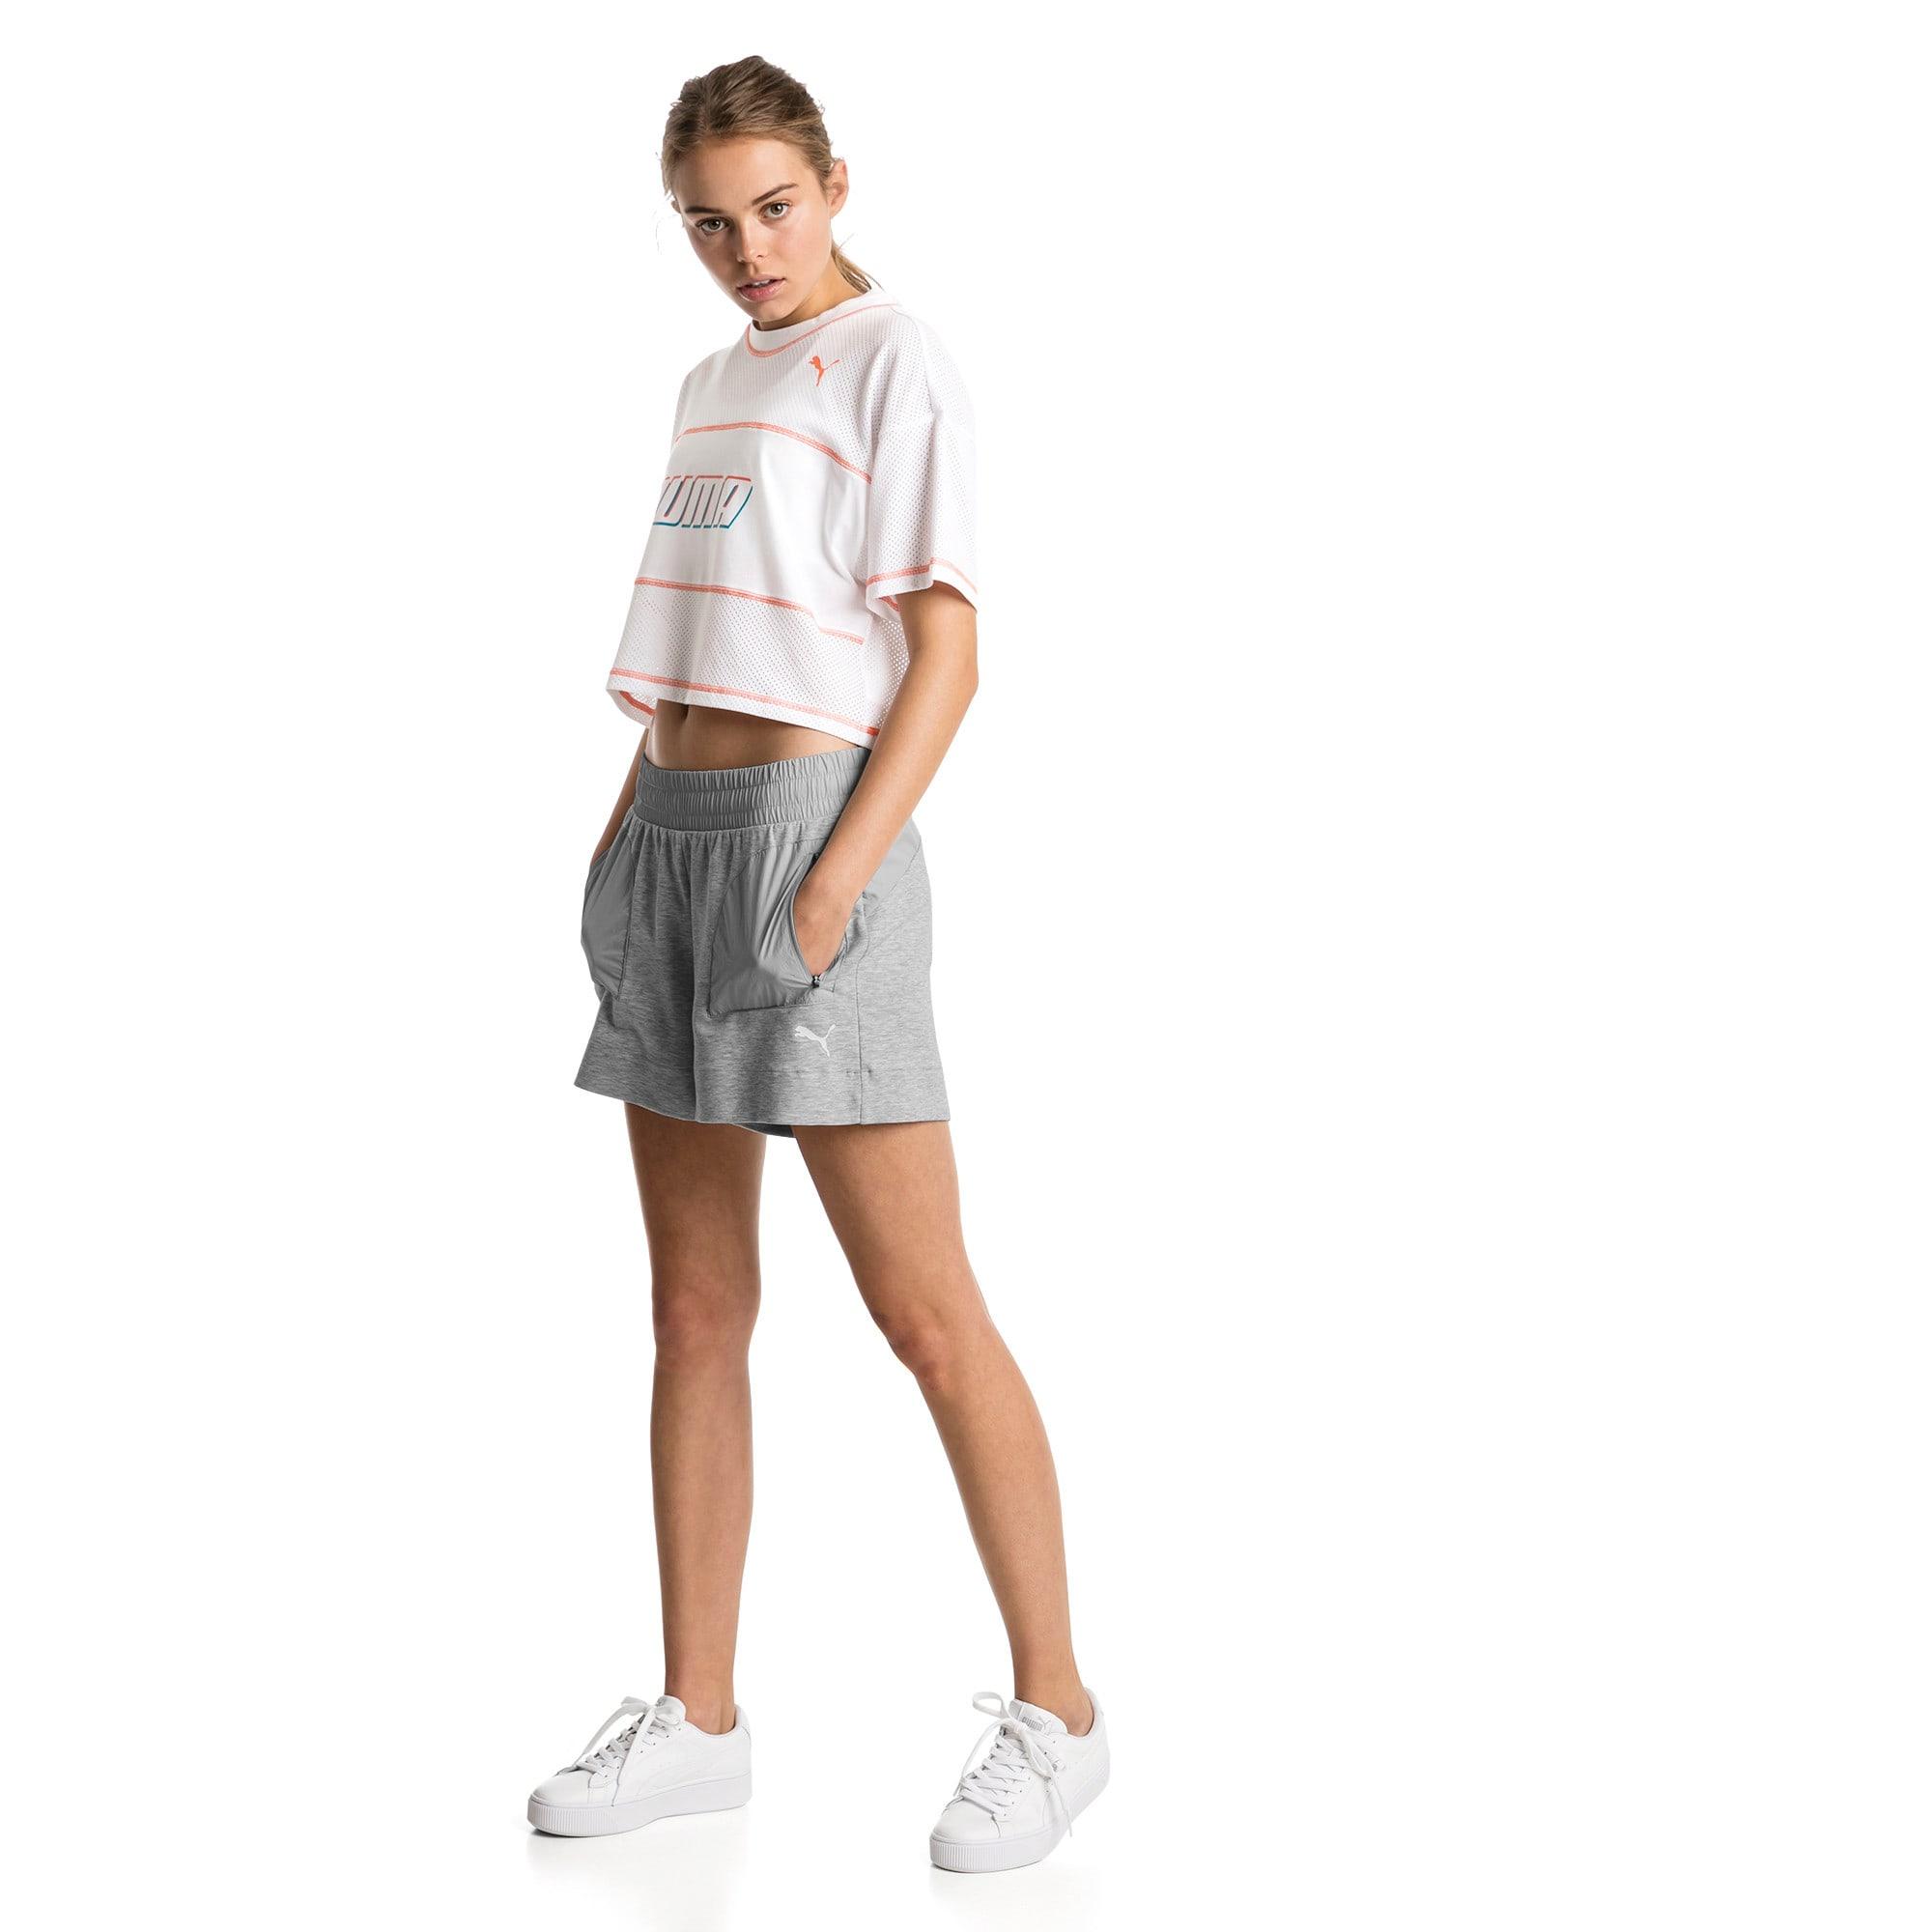 Thumbnail 3 of Evostripe Lite Women's Shorts, Light Gray Heather, medium